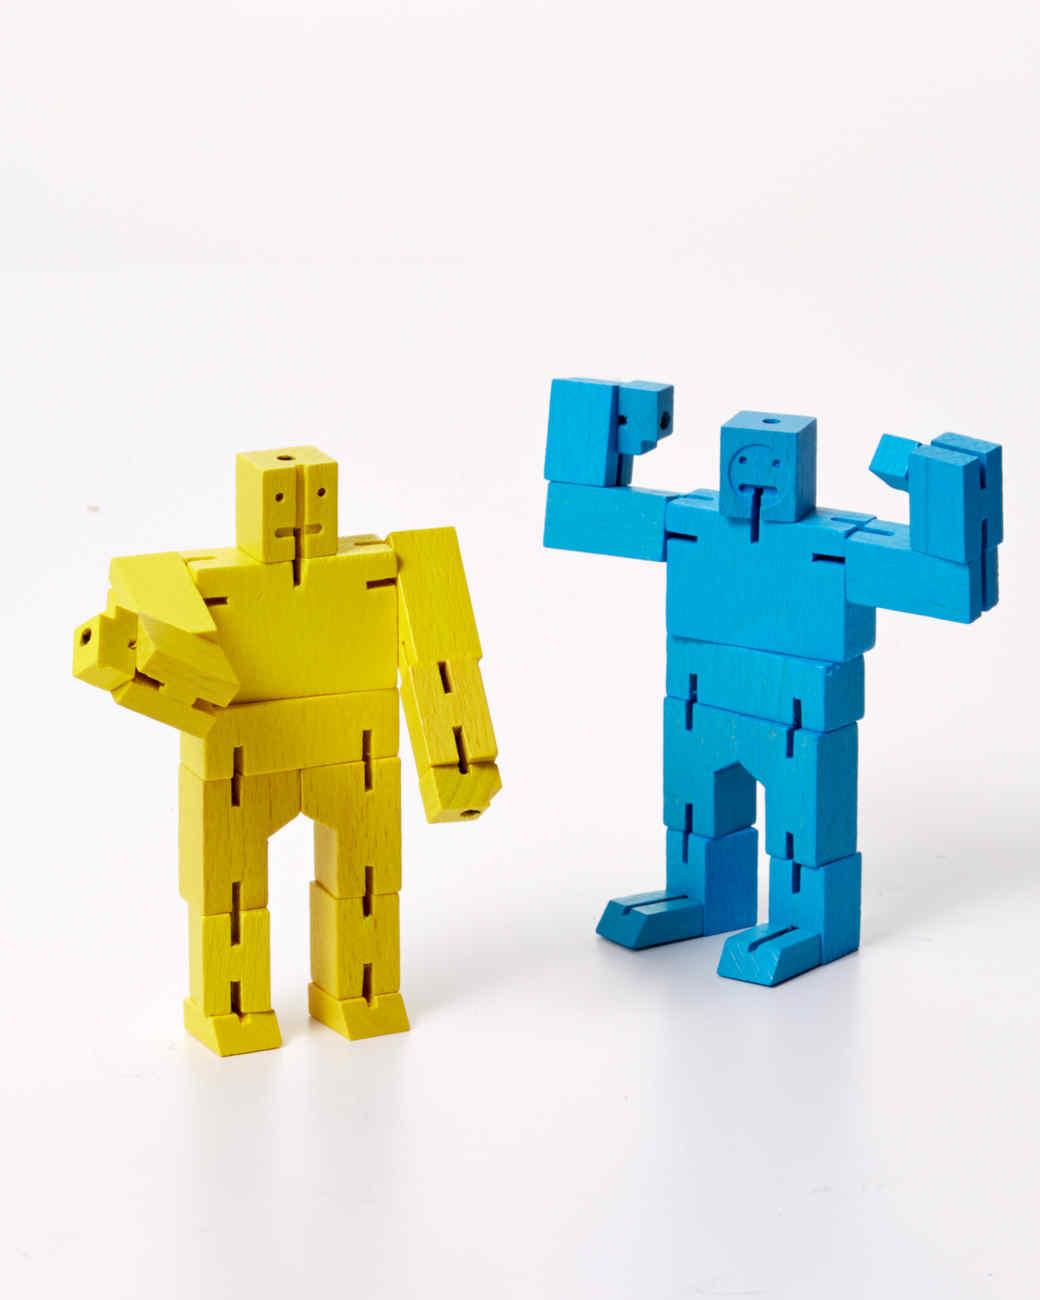 boy-basket-cubebot-2756-d112789-0116.jpg